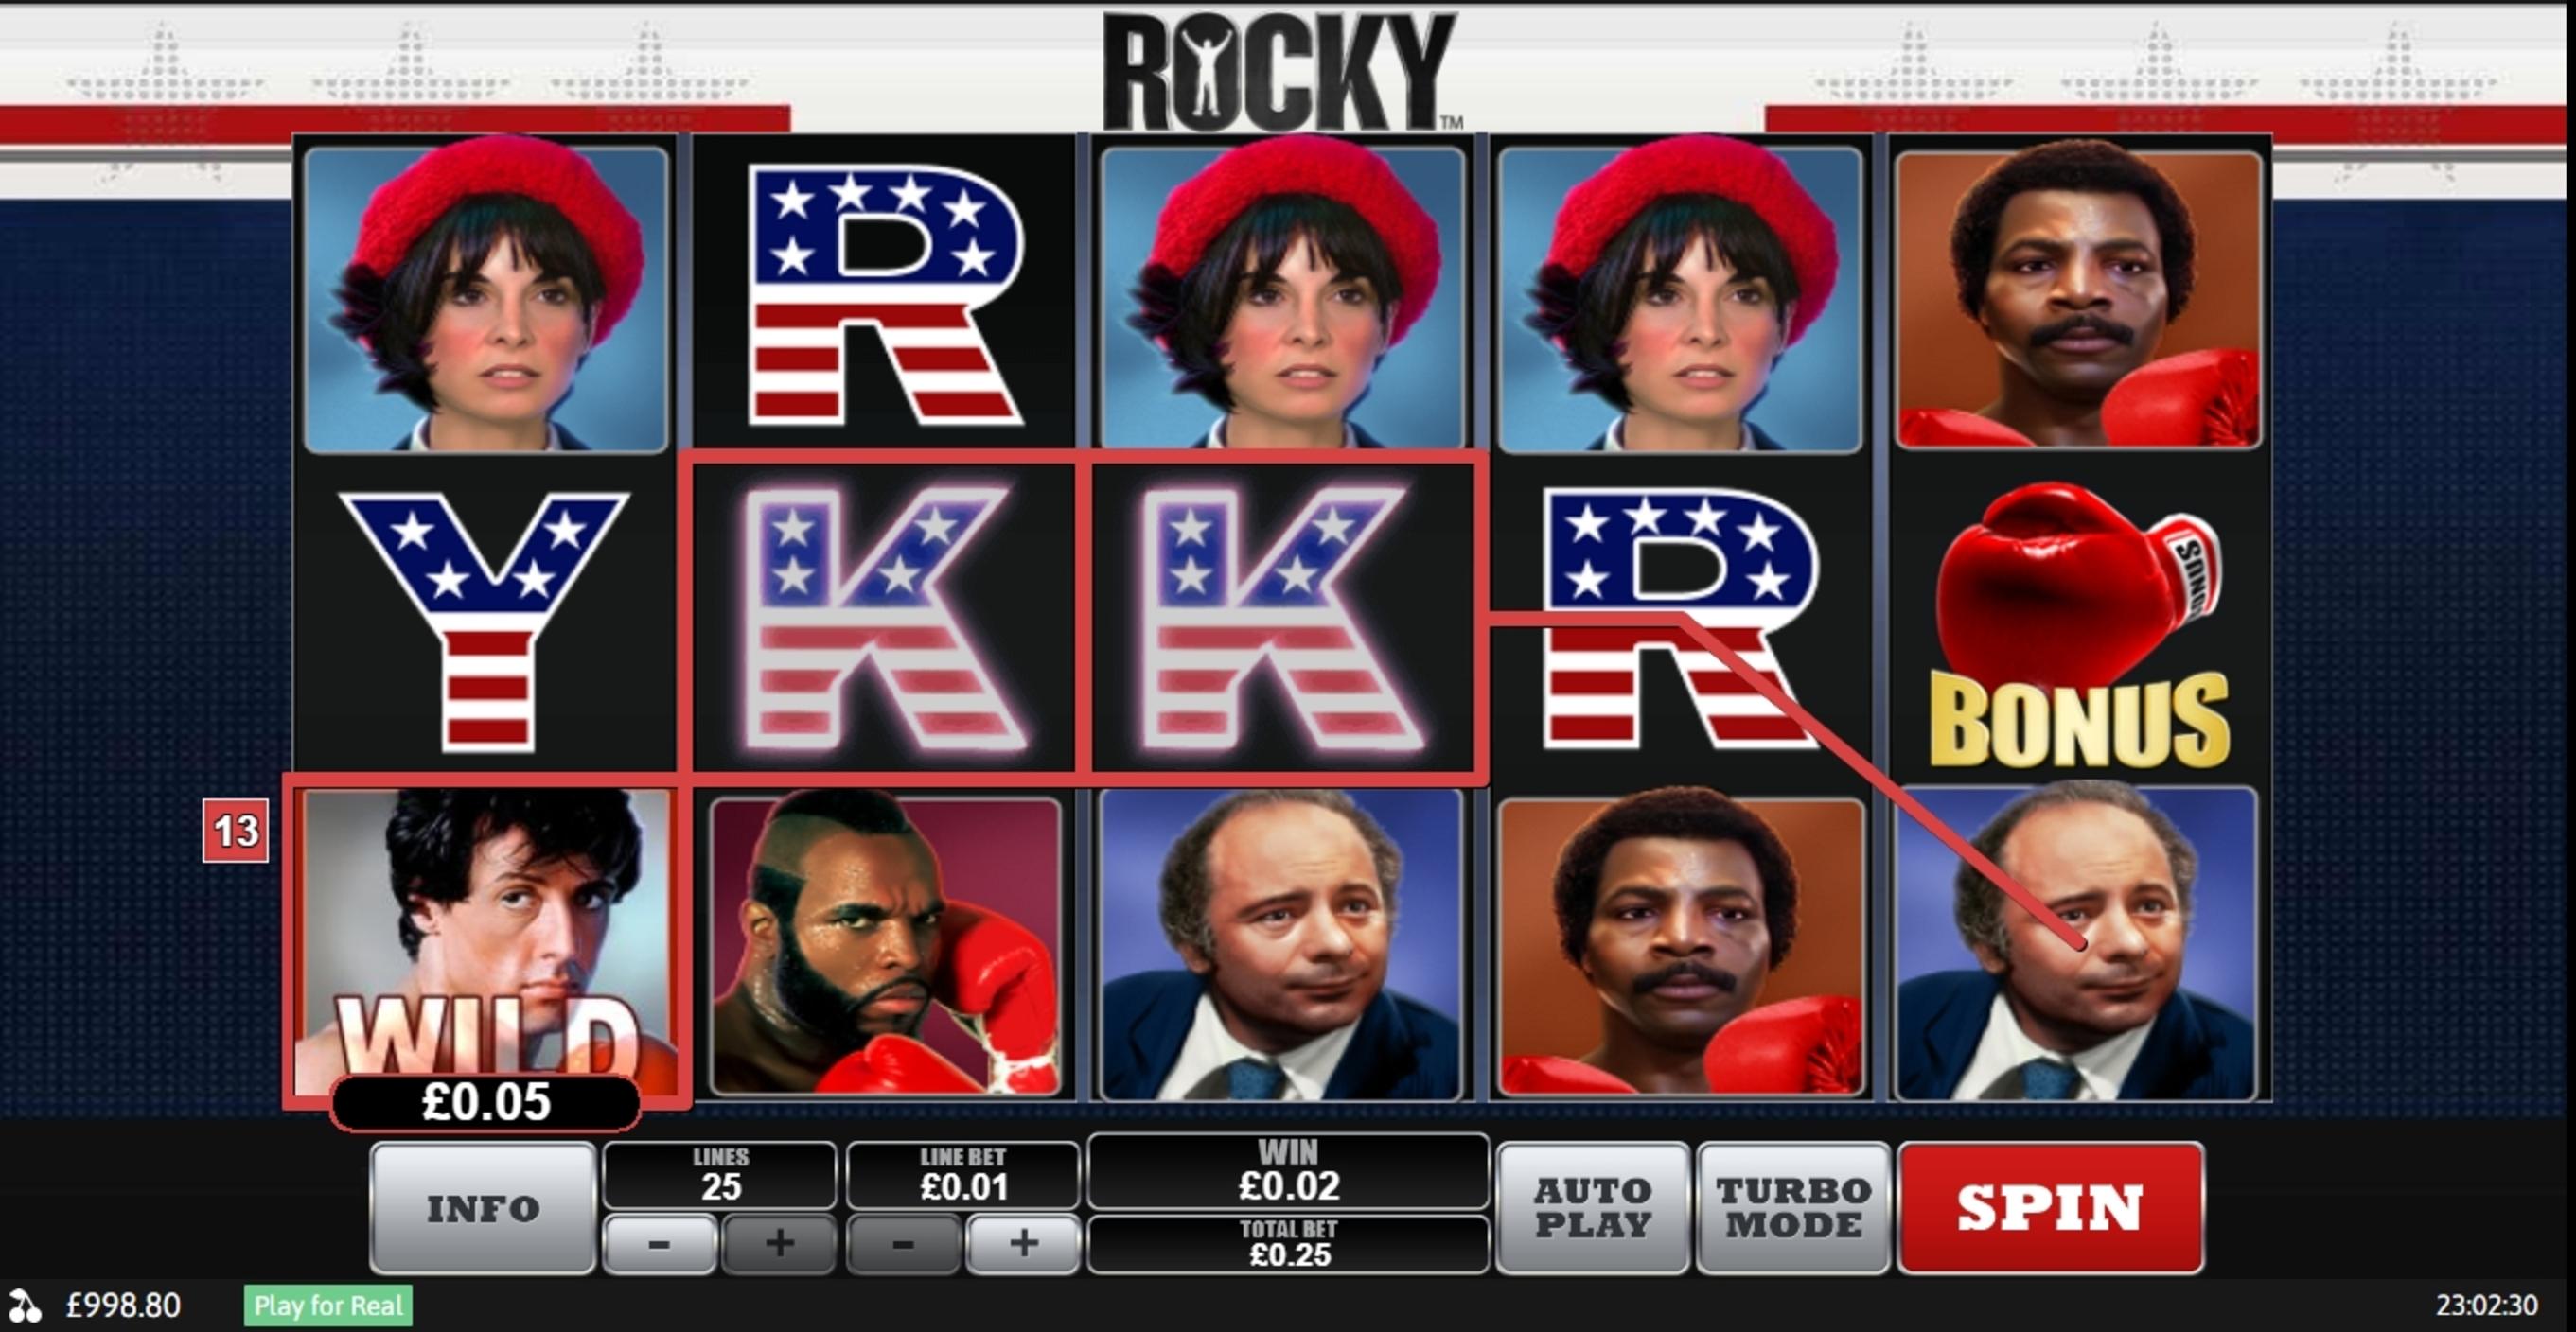 Rocky Slot Machine Online